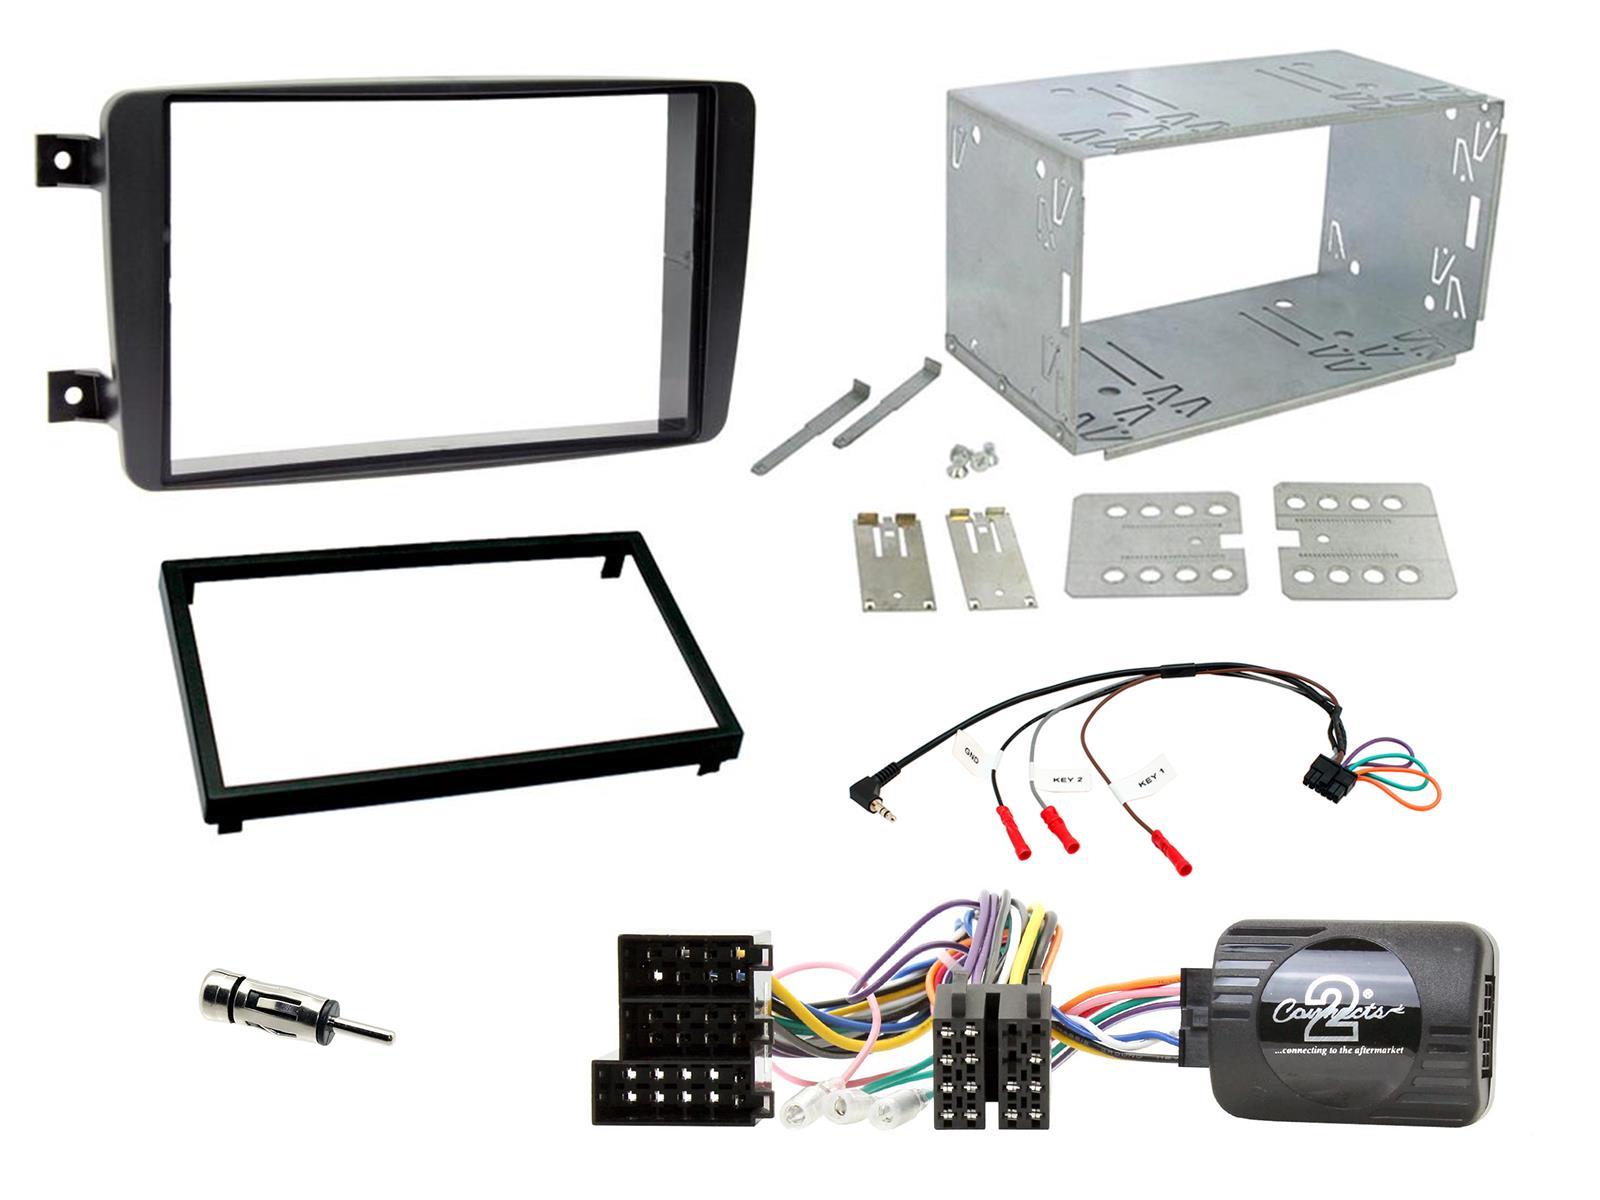 Connects 2 ctkmb 12 Mercedes Clase a 04-12 doble DIN Kit de montaje completo